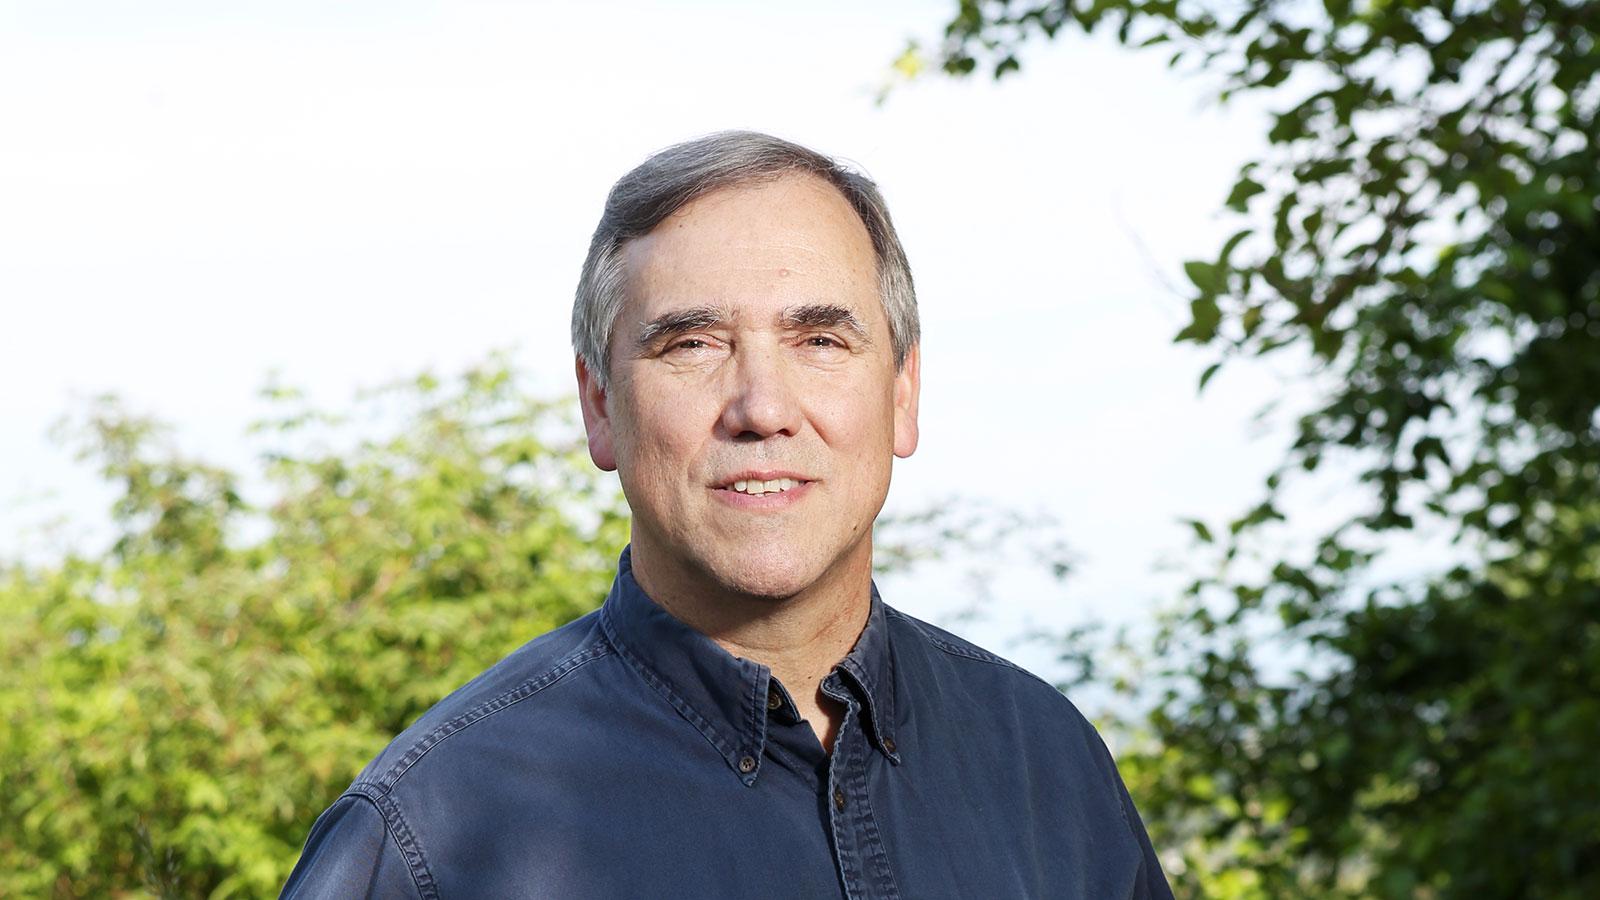 HRC Endorses Sen. Jeff Merkley for Reelection